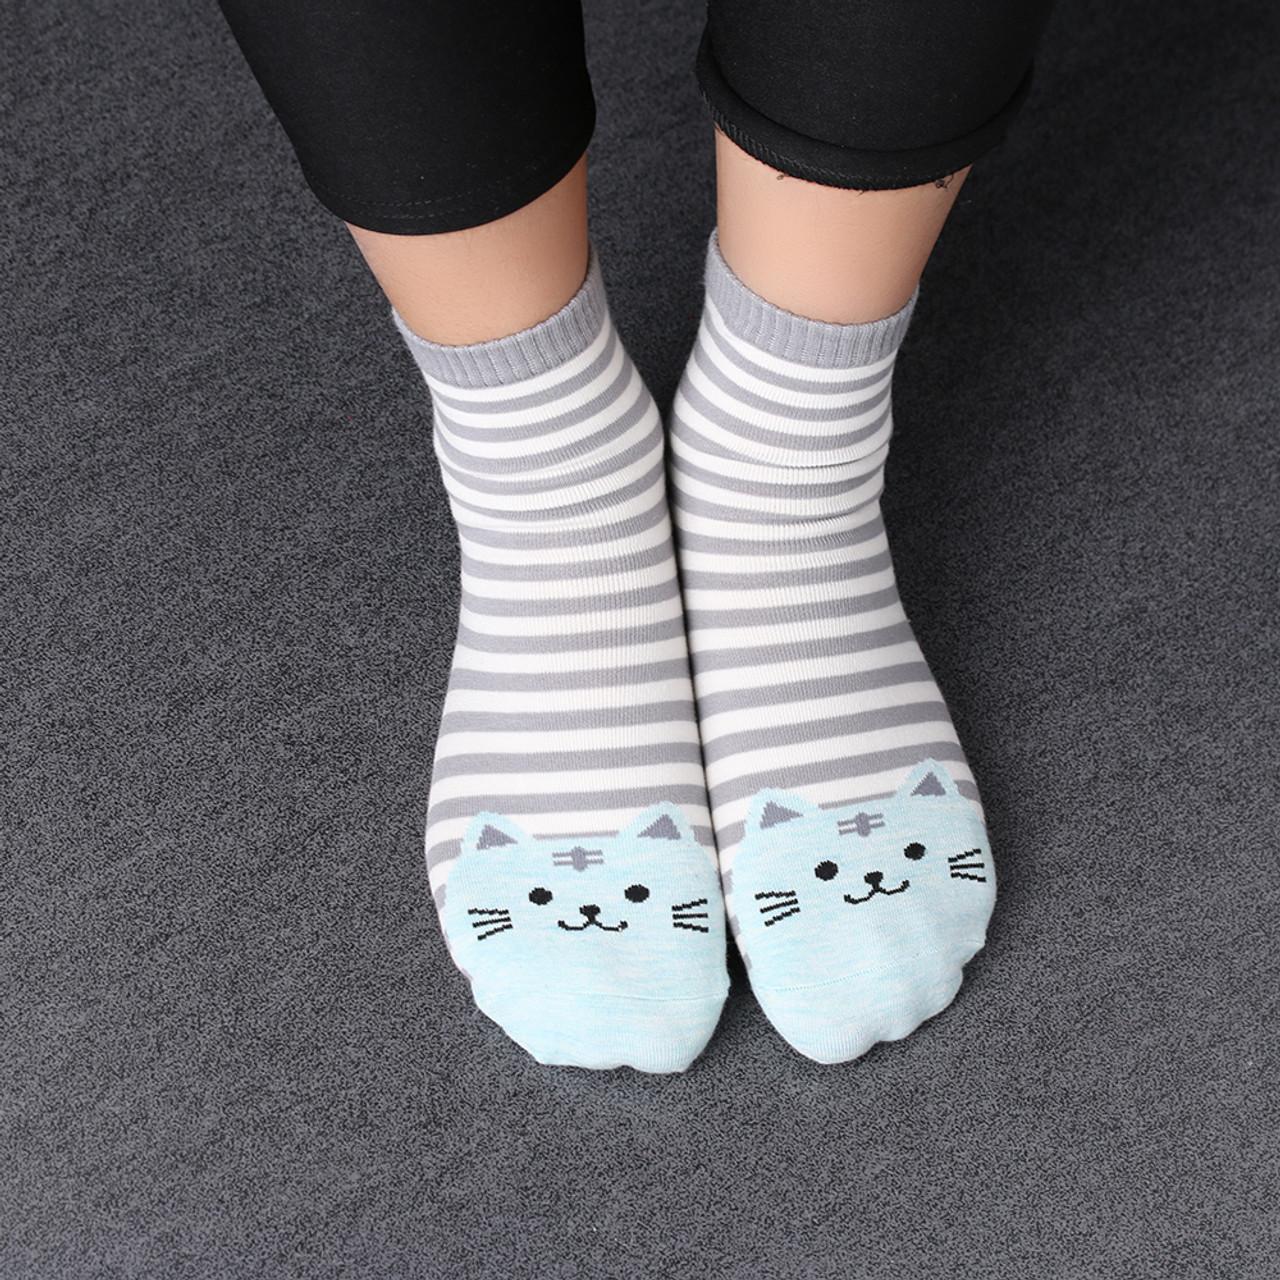 03e60f9c33238 Cat Light Blue with Gray and White Stripe Socks - CC110 ...